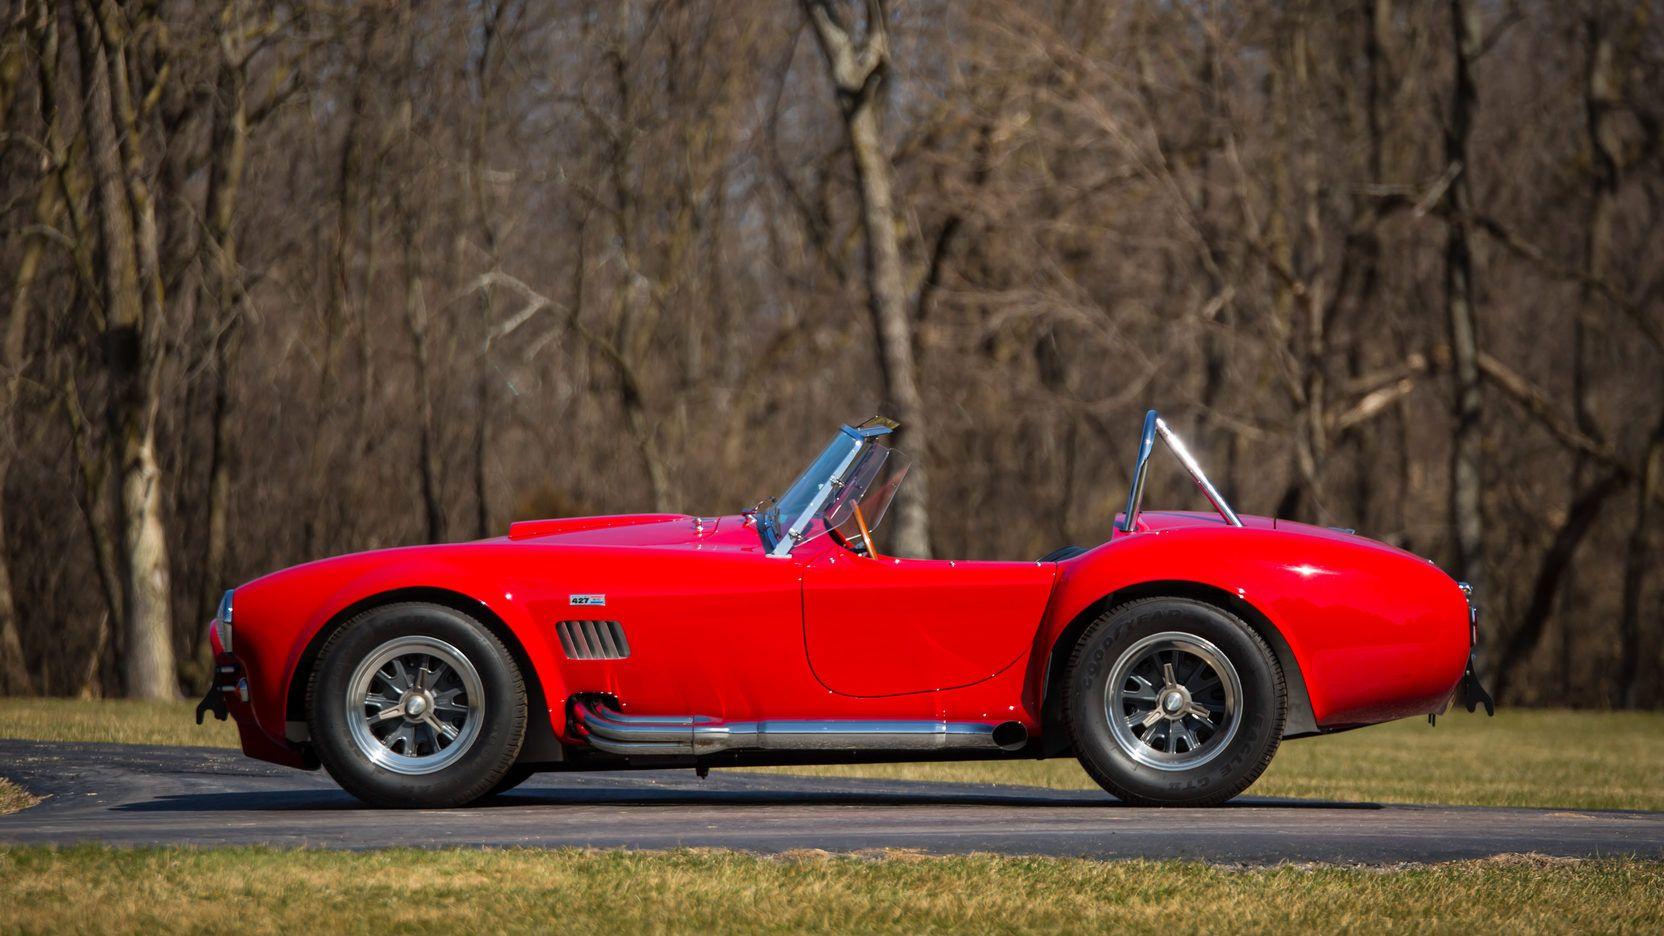 1965 shelby cobra csx4000 series csx4218 427 ci 4 speed